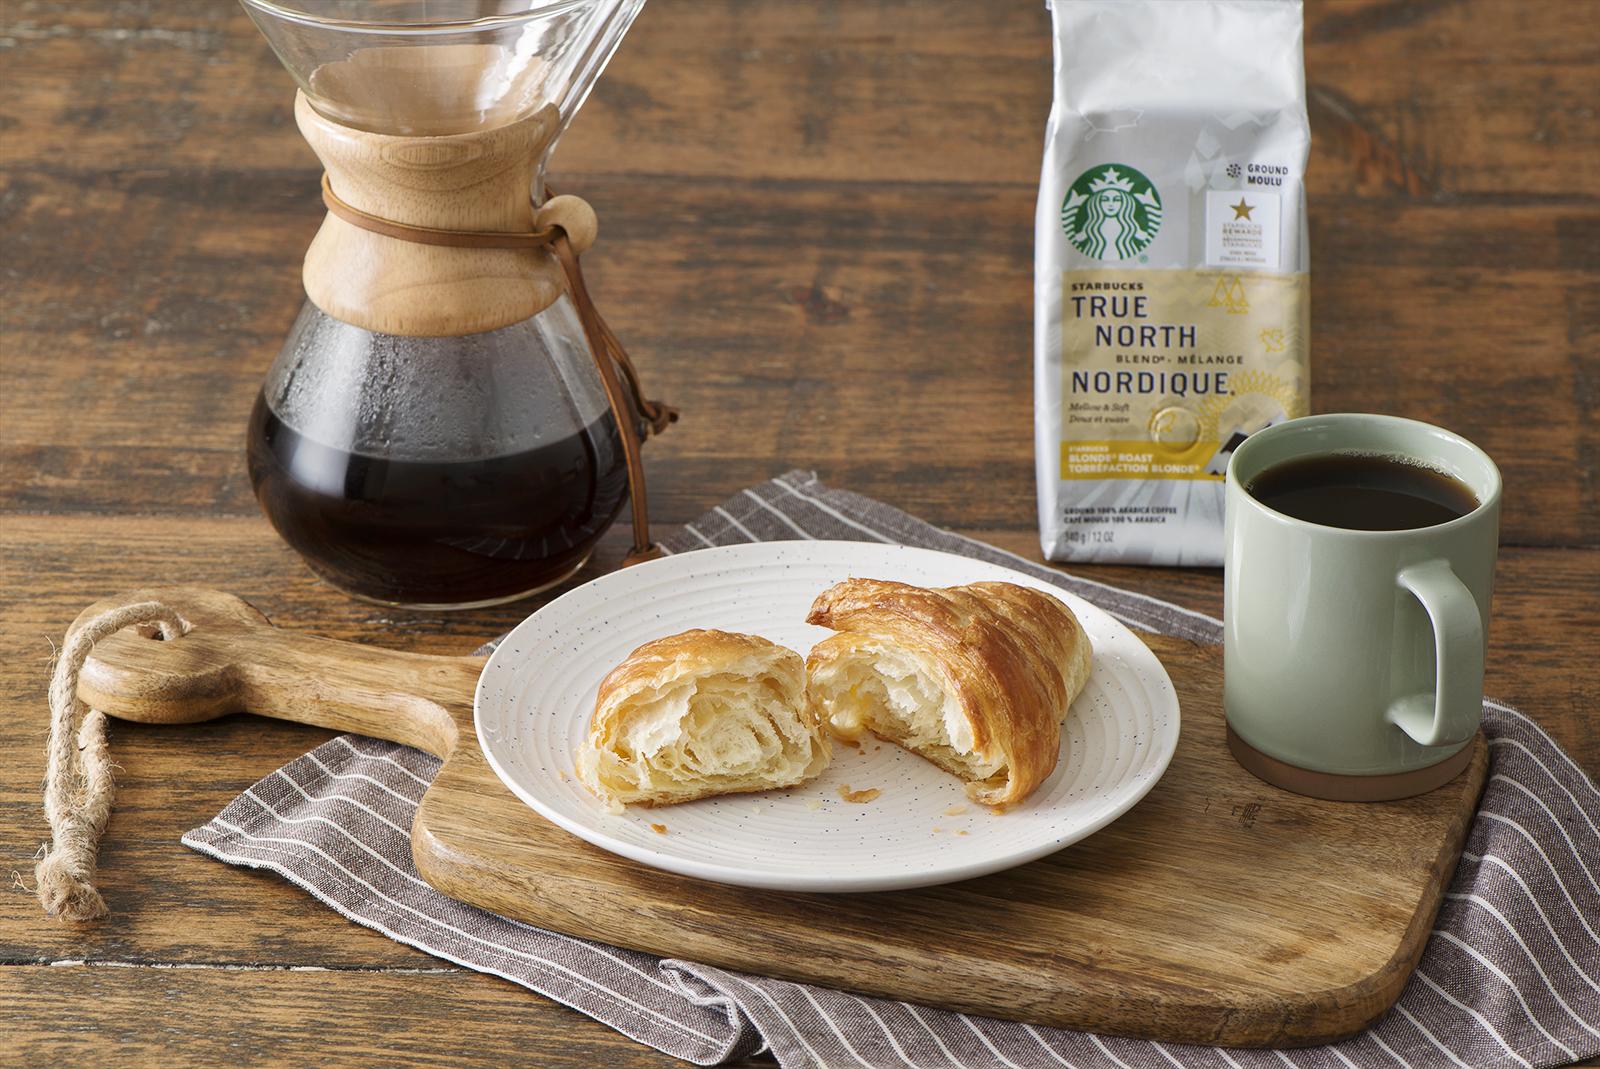 ACE Butter Croissant + Starbucks True North-033 copy.jpg